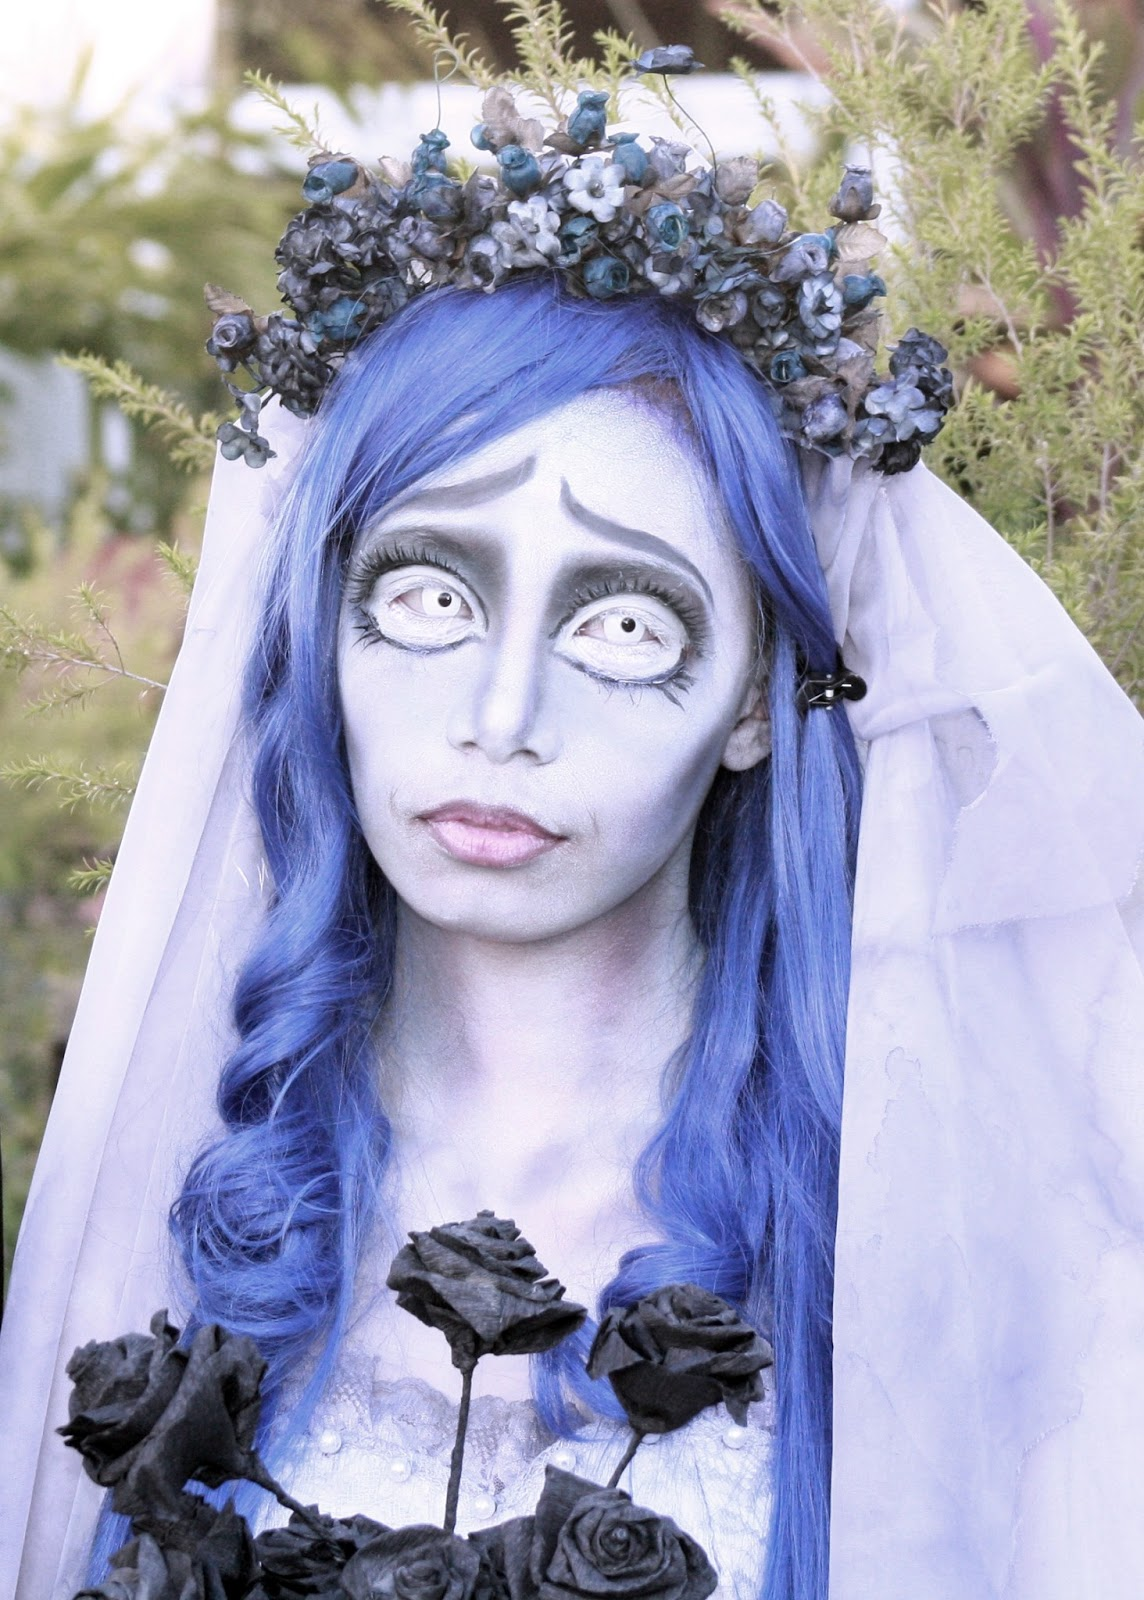 Oishari diy corpse bride cosplay 9513 solutioingenieria Image collections